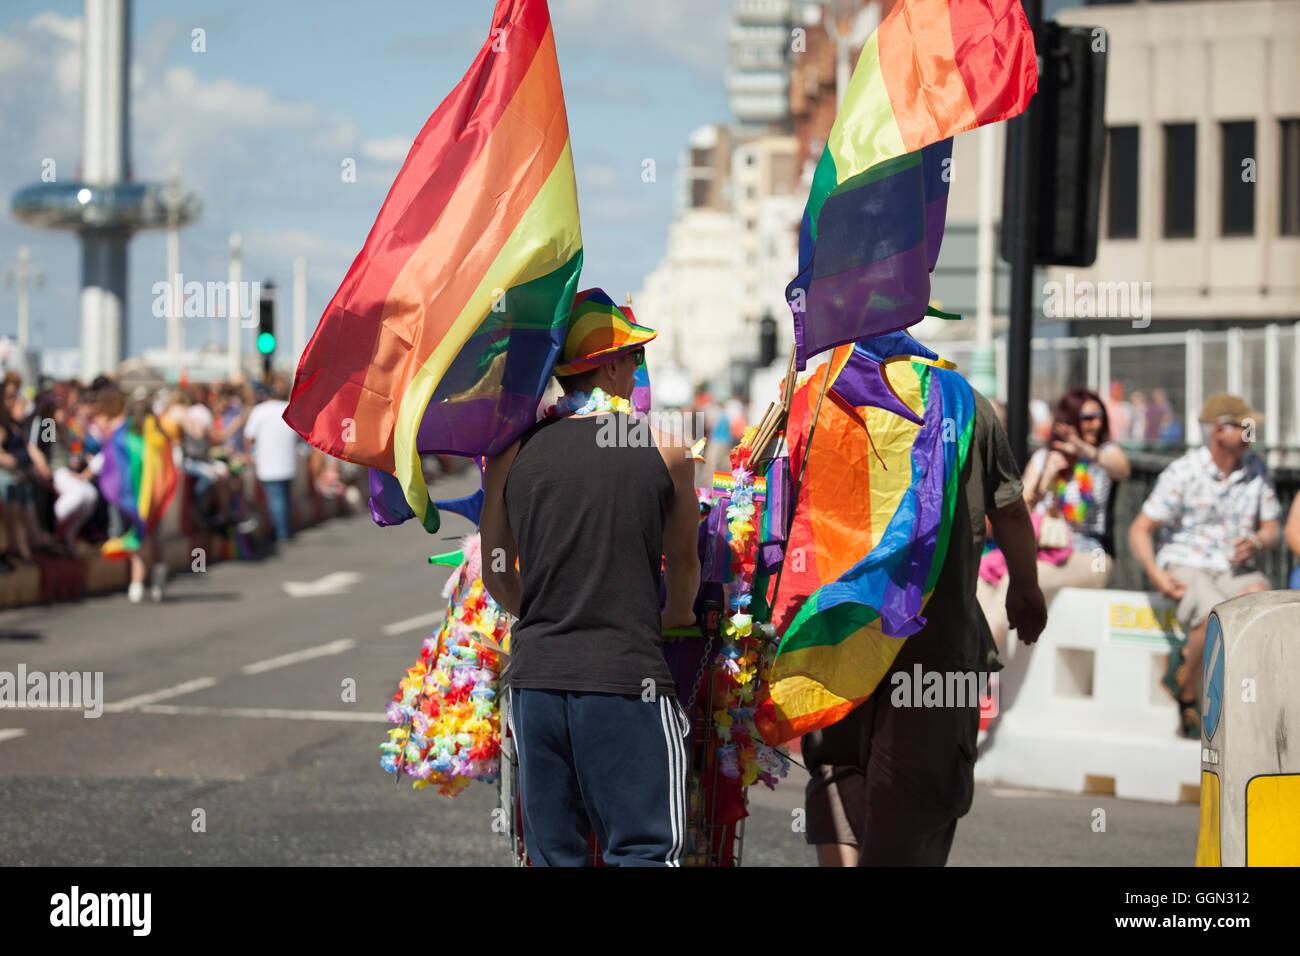 Brighton Pride 6th August 2016, England. - Stock Image